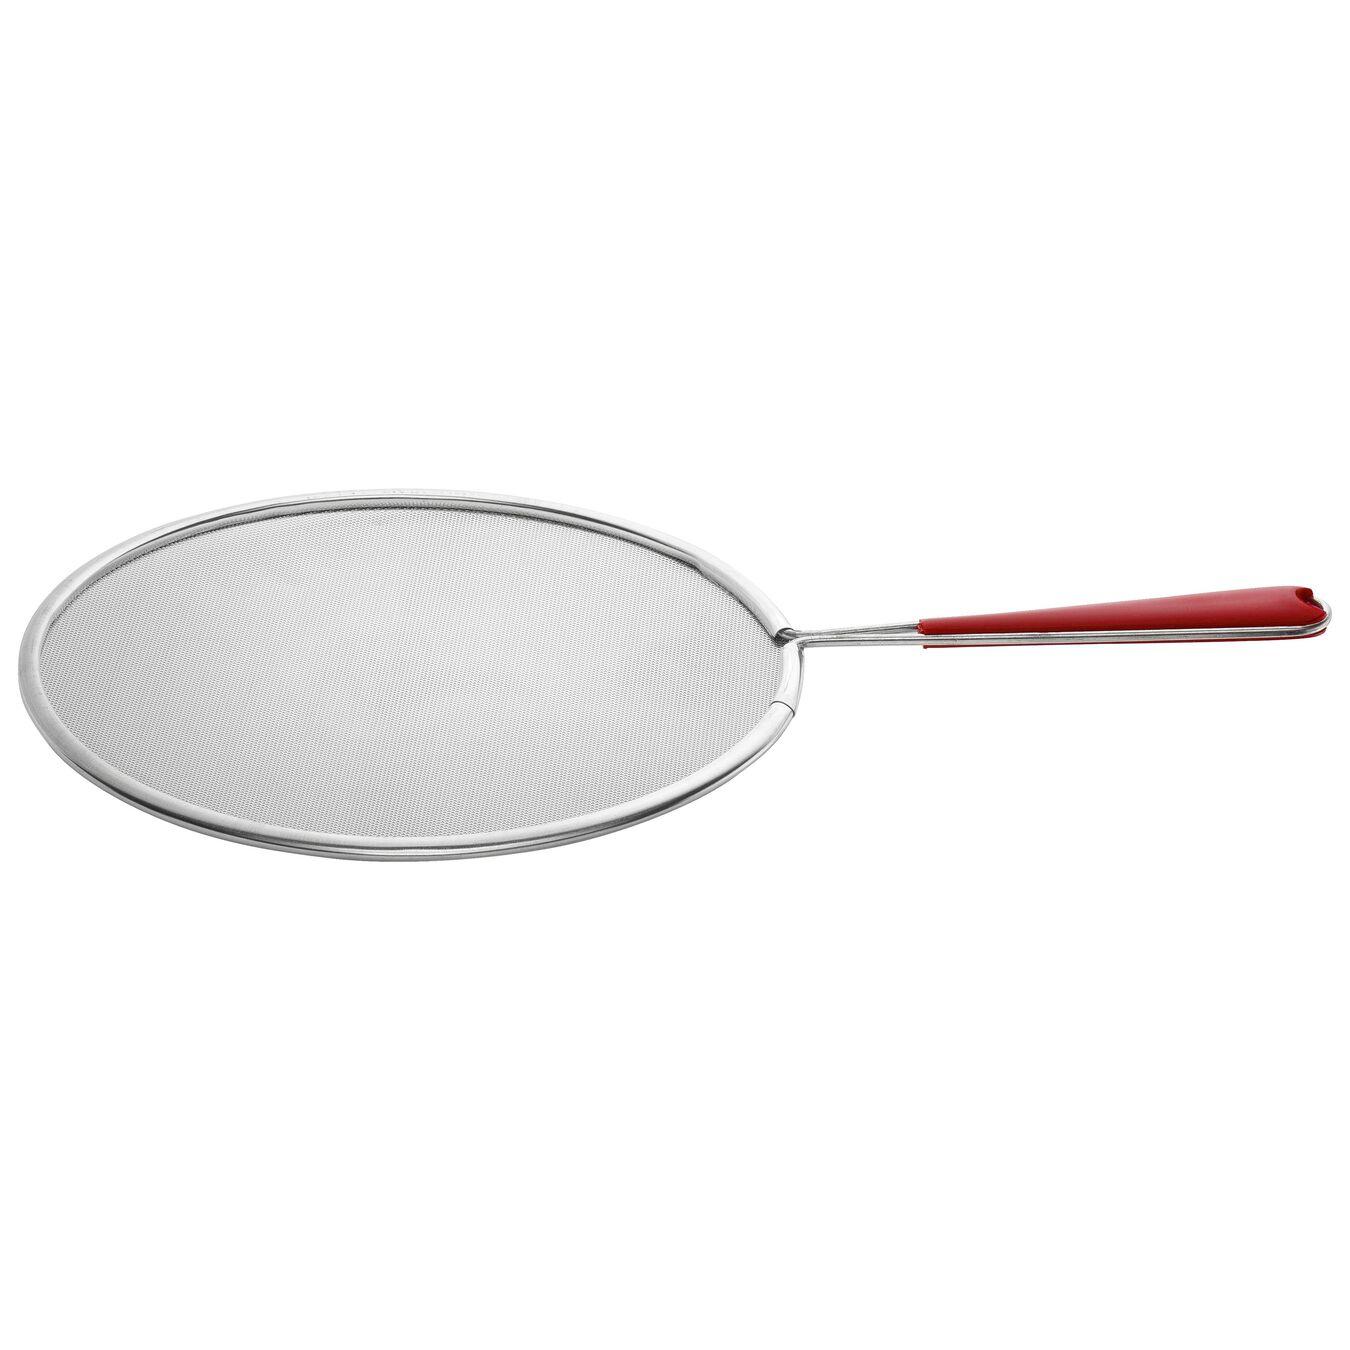 Paraspruzzi - 20 cm, alluminio,,large 1